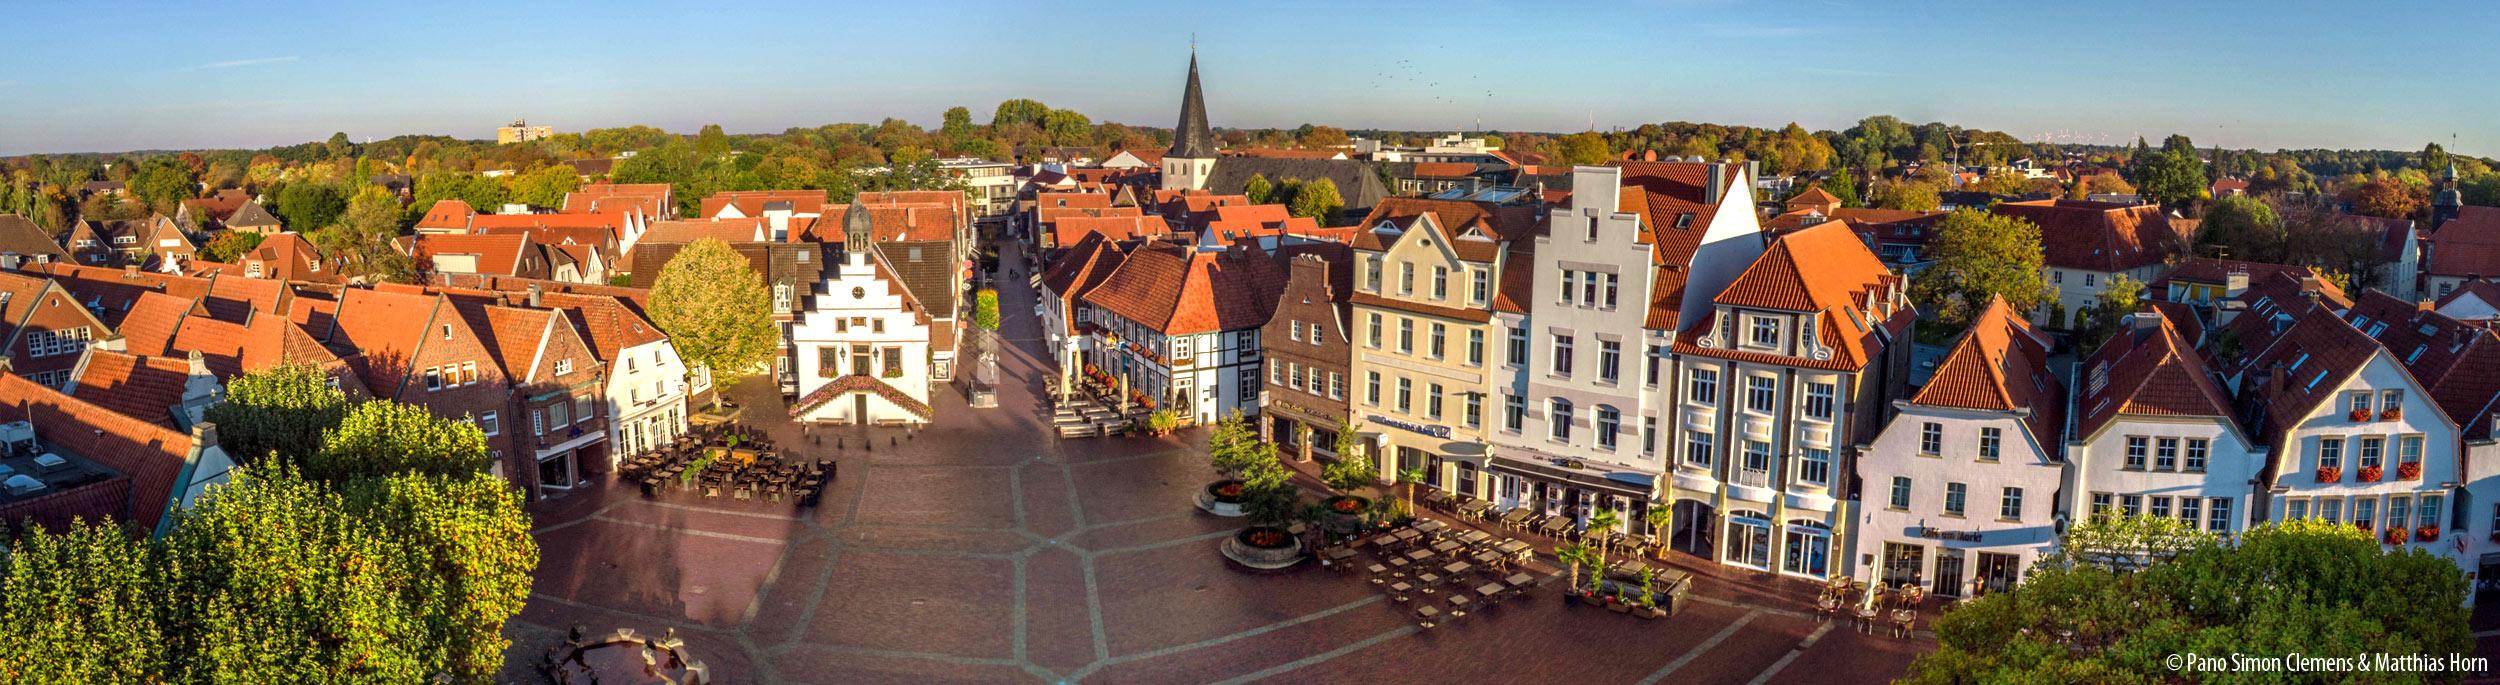 Panorama Lingen Marktplatz